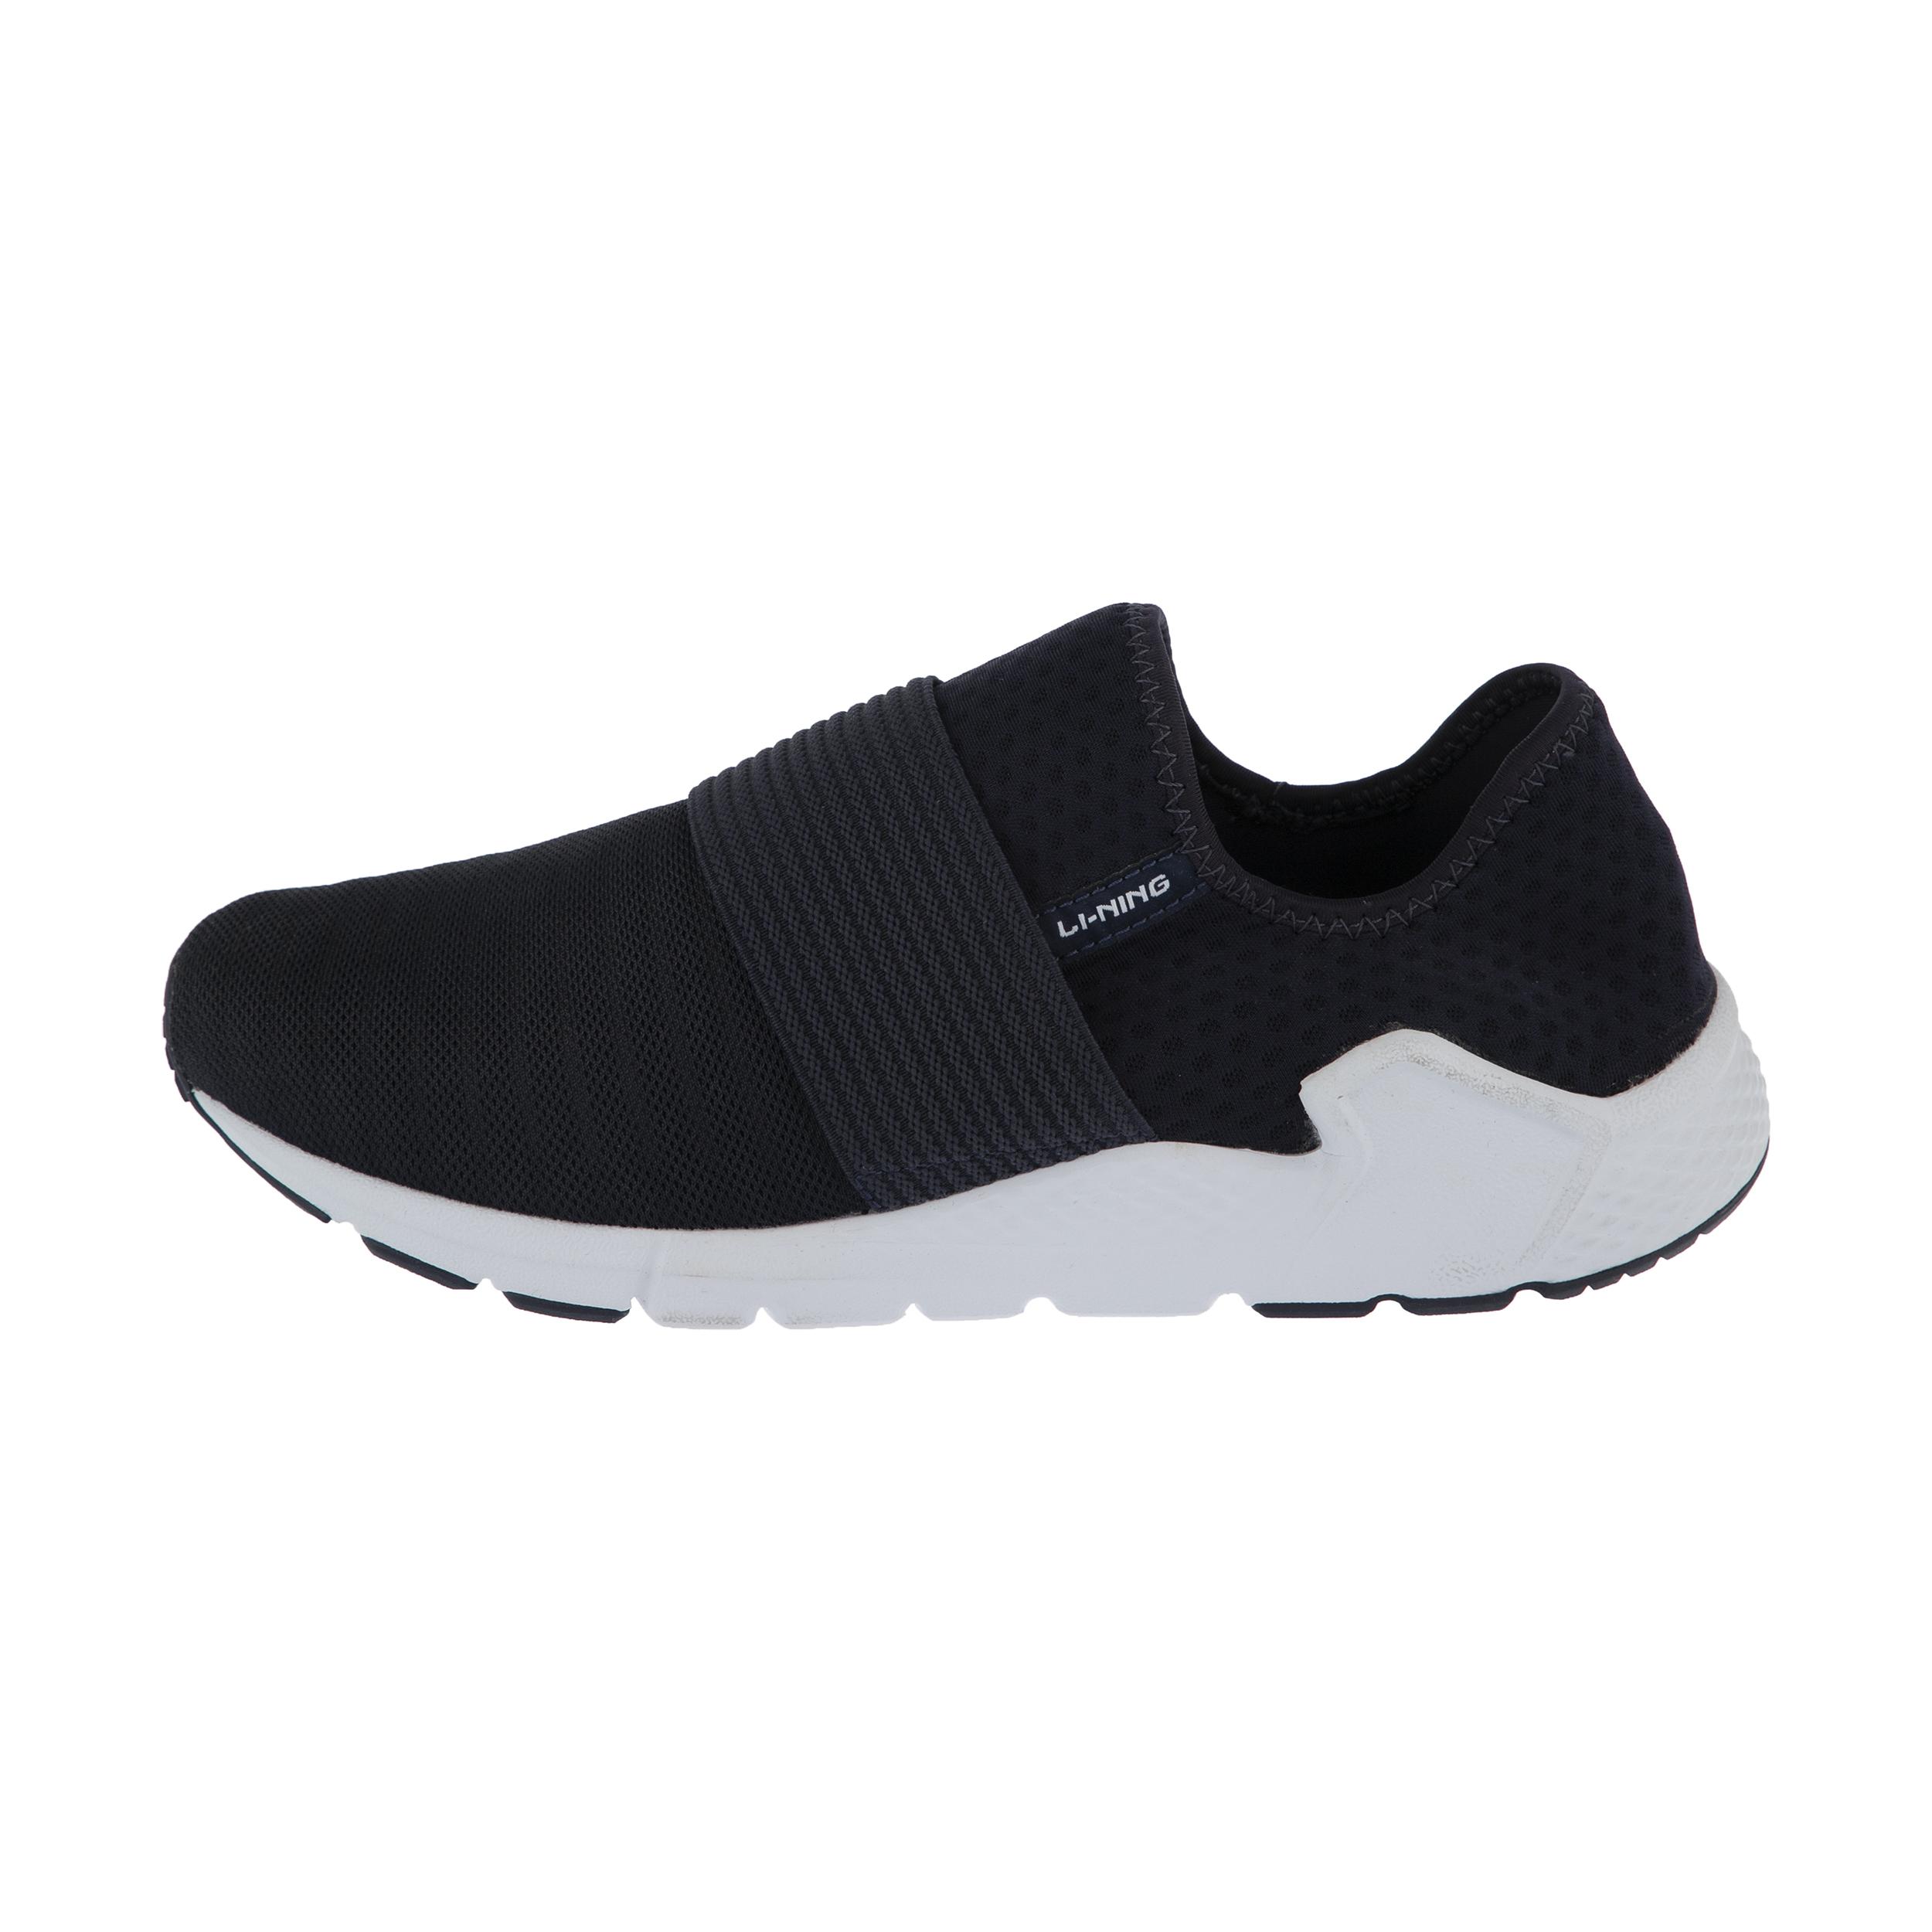 کفش راحتی مردانه لینینگ مدل AGCN111-3B